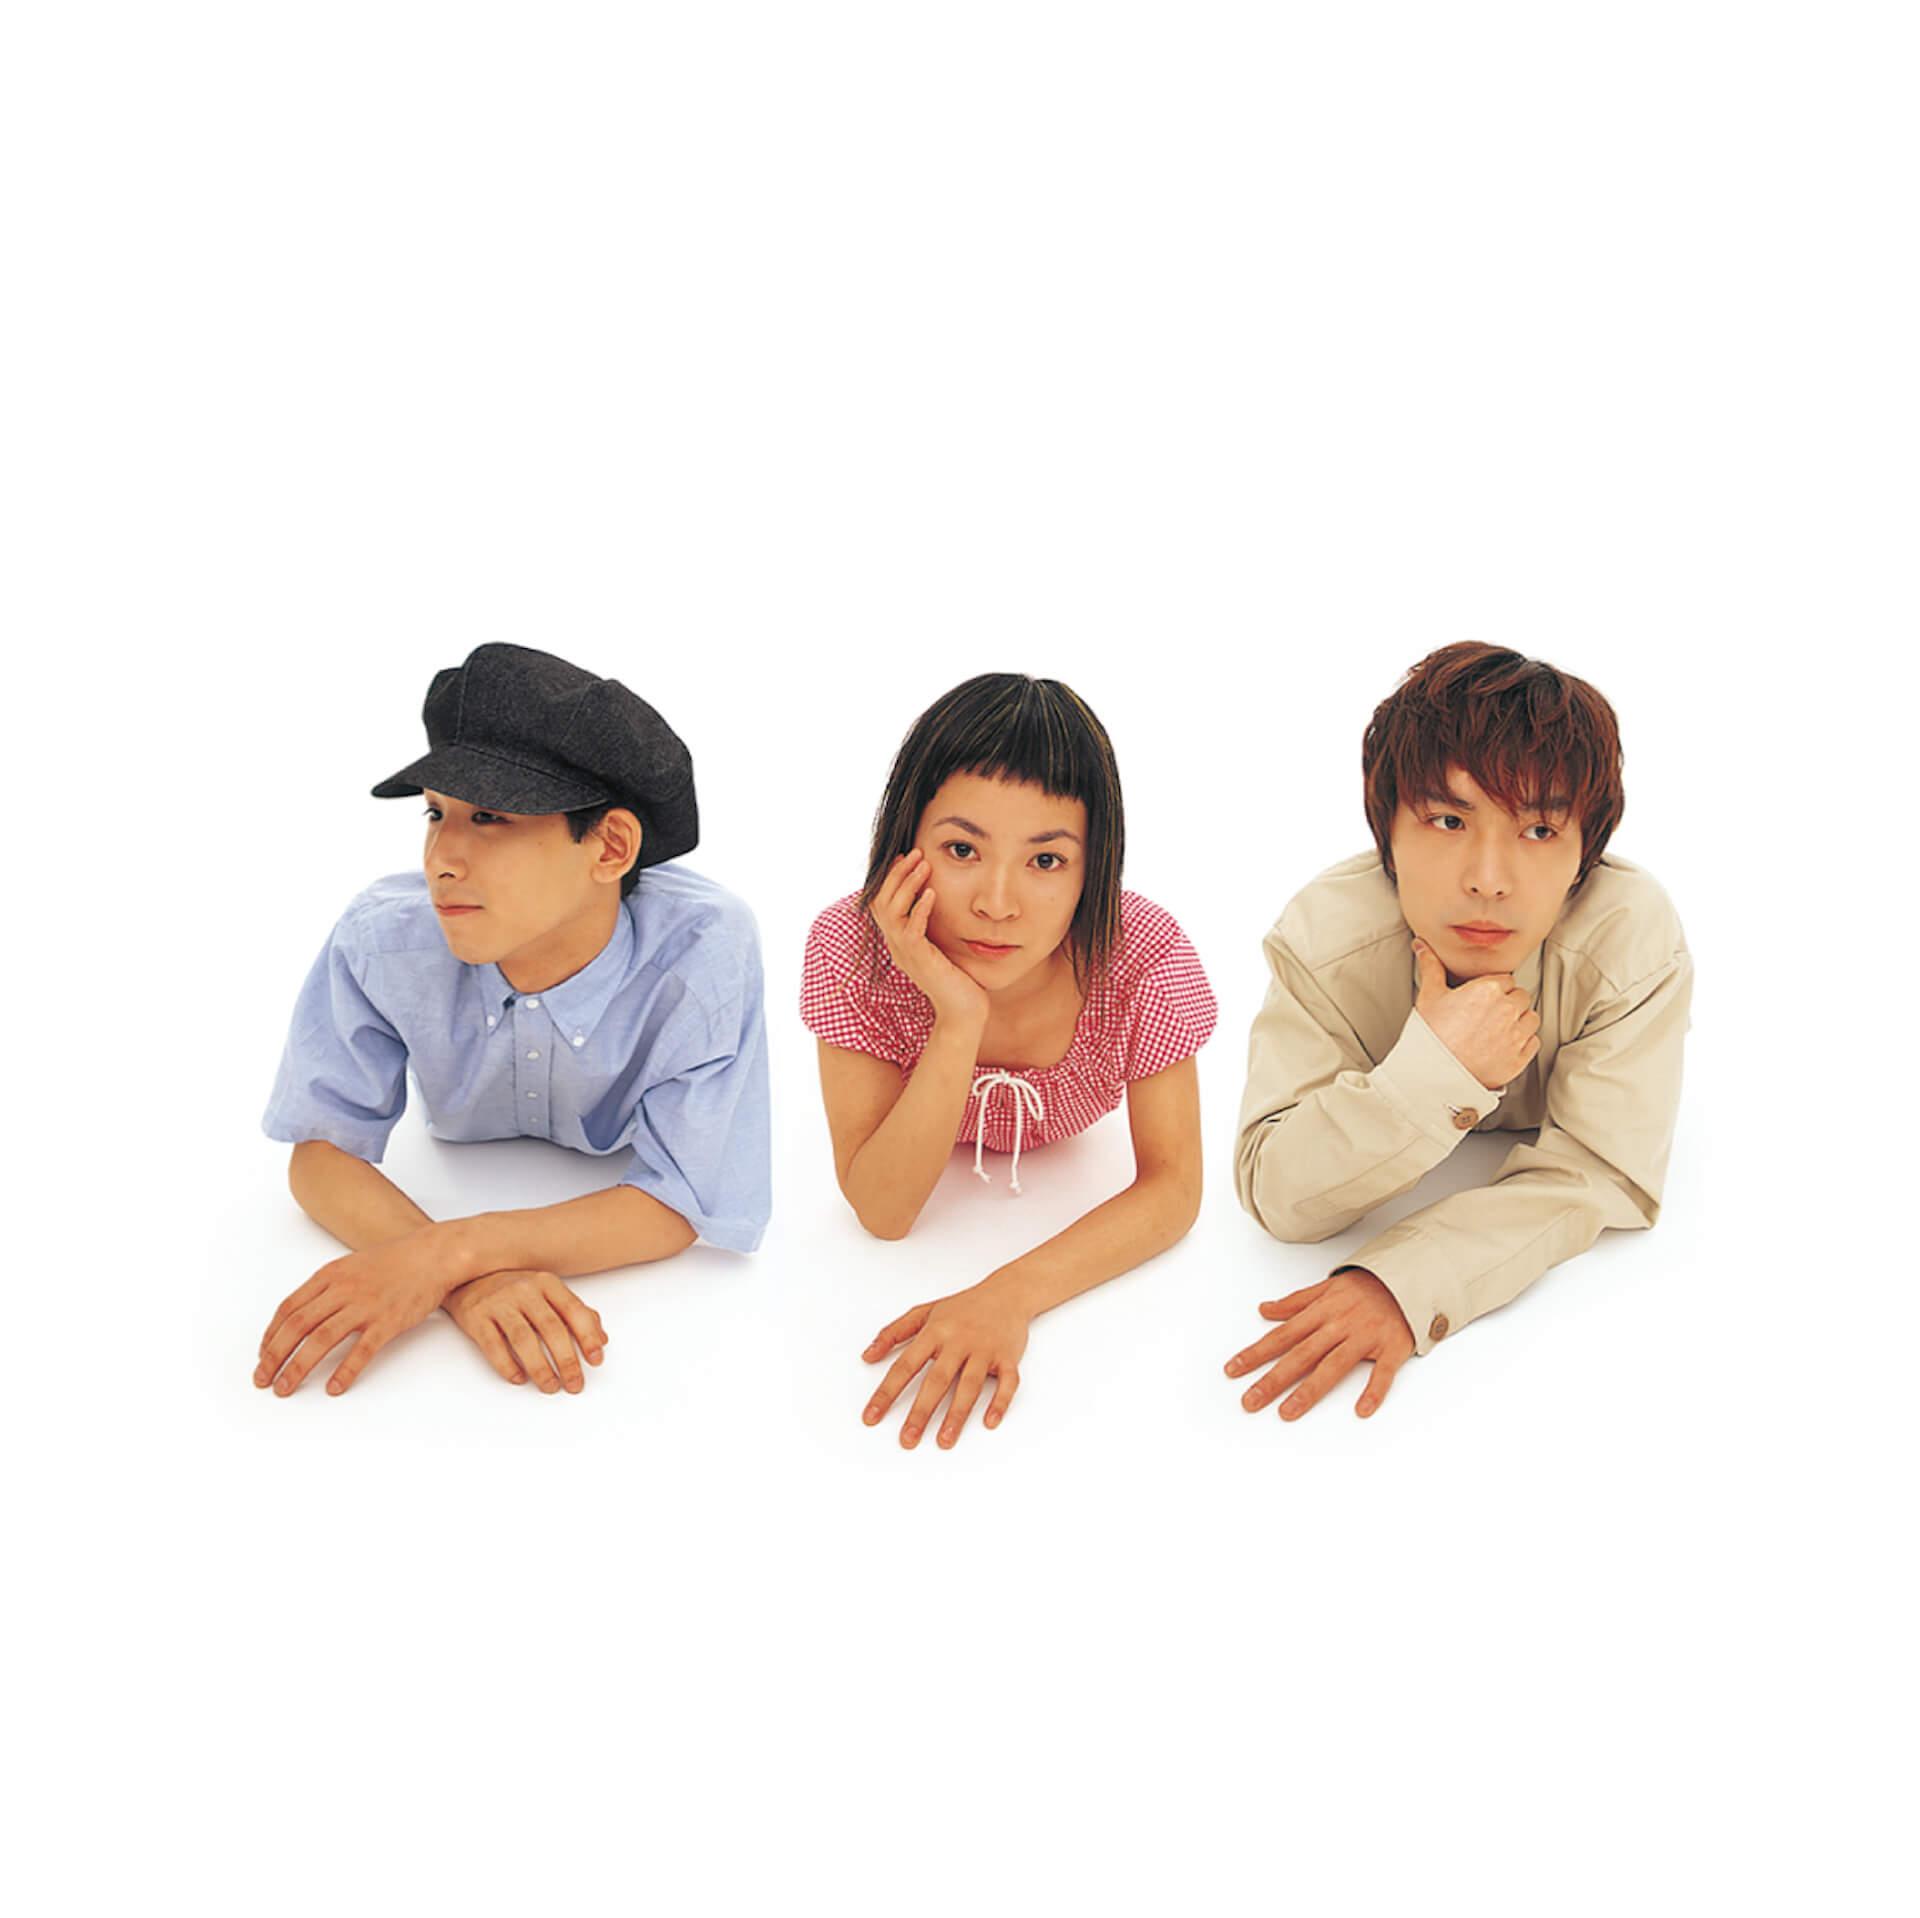 LIQUIDROOM15周年公演にnever young beach×七尾旅人、クラムボン『JP』完全再現、追加でCompuma、Licaxxxらが発表 music190626-liquidroom15th-1